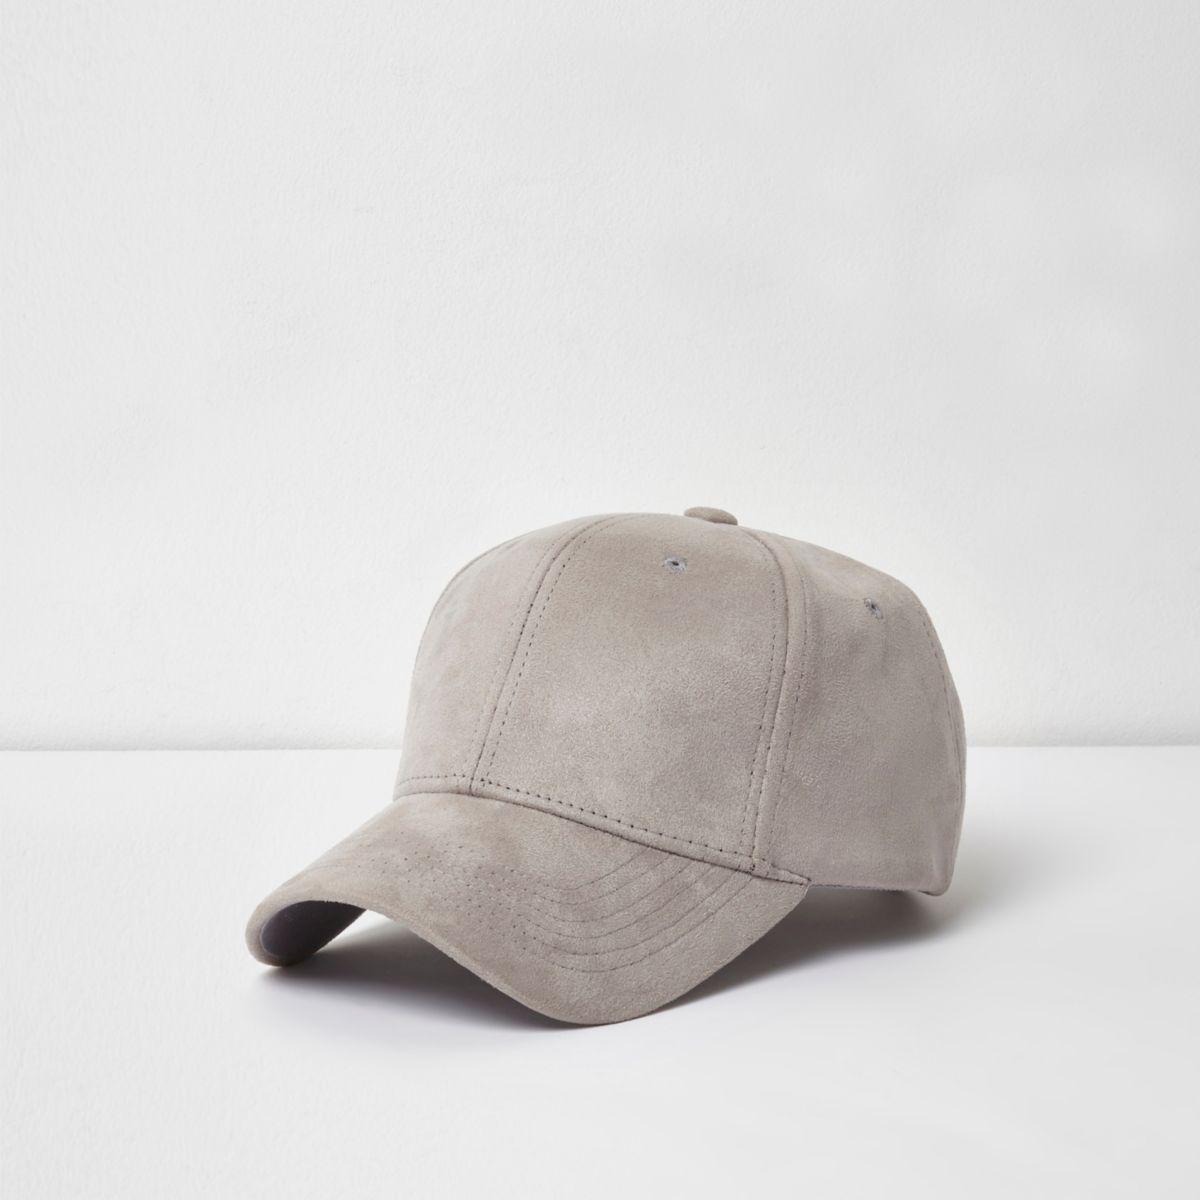 Light grey faux suede baseball cap